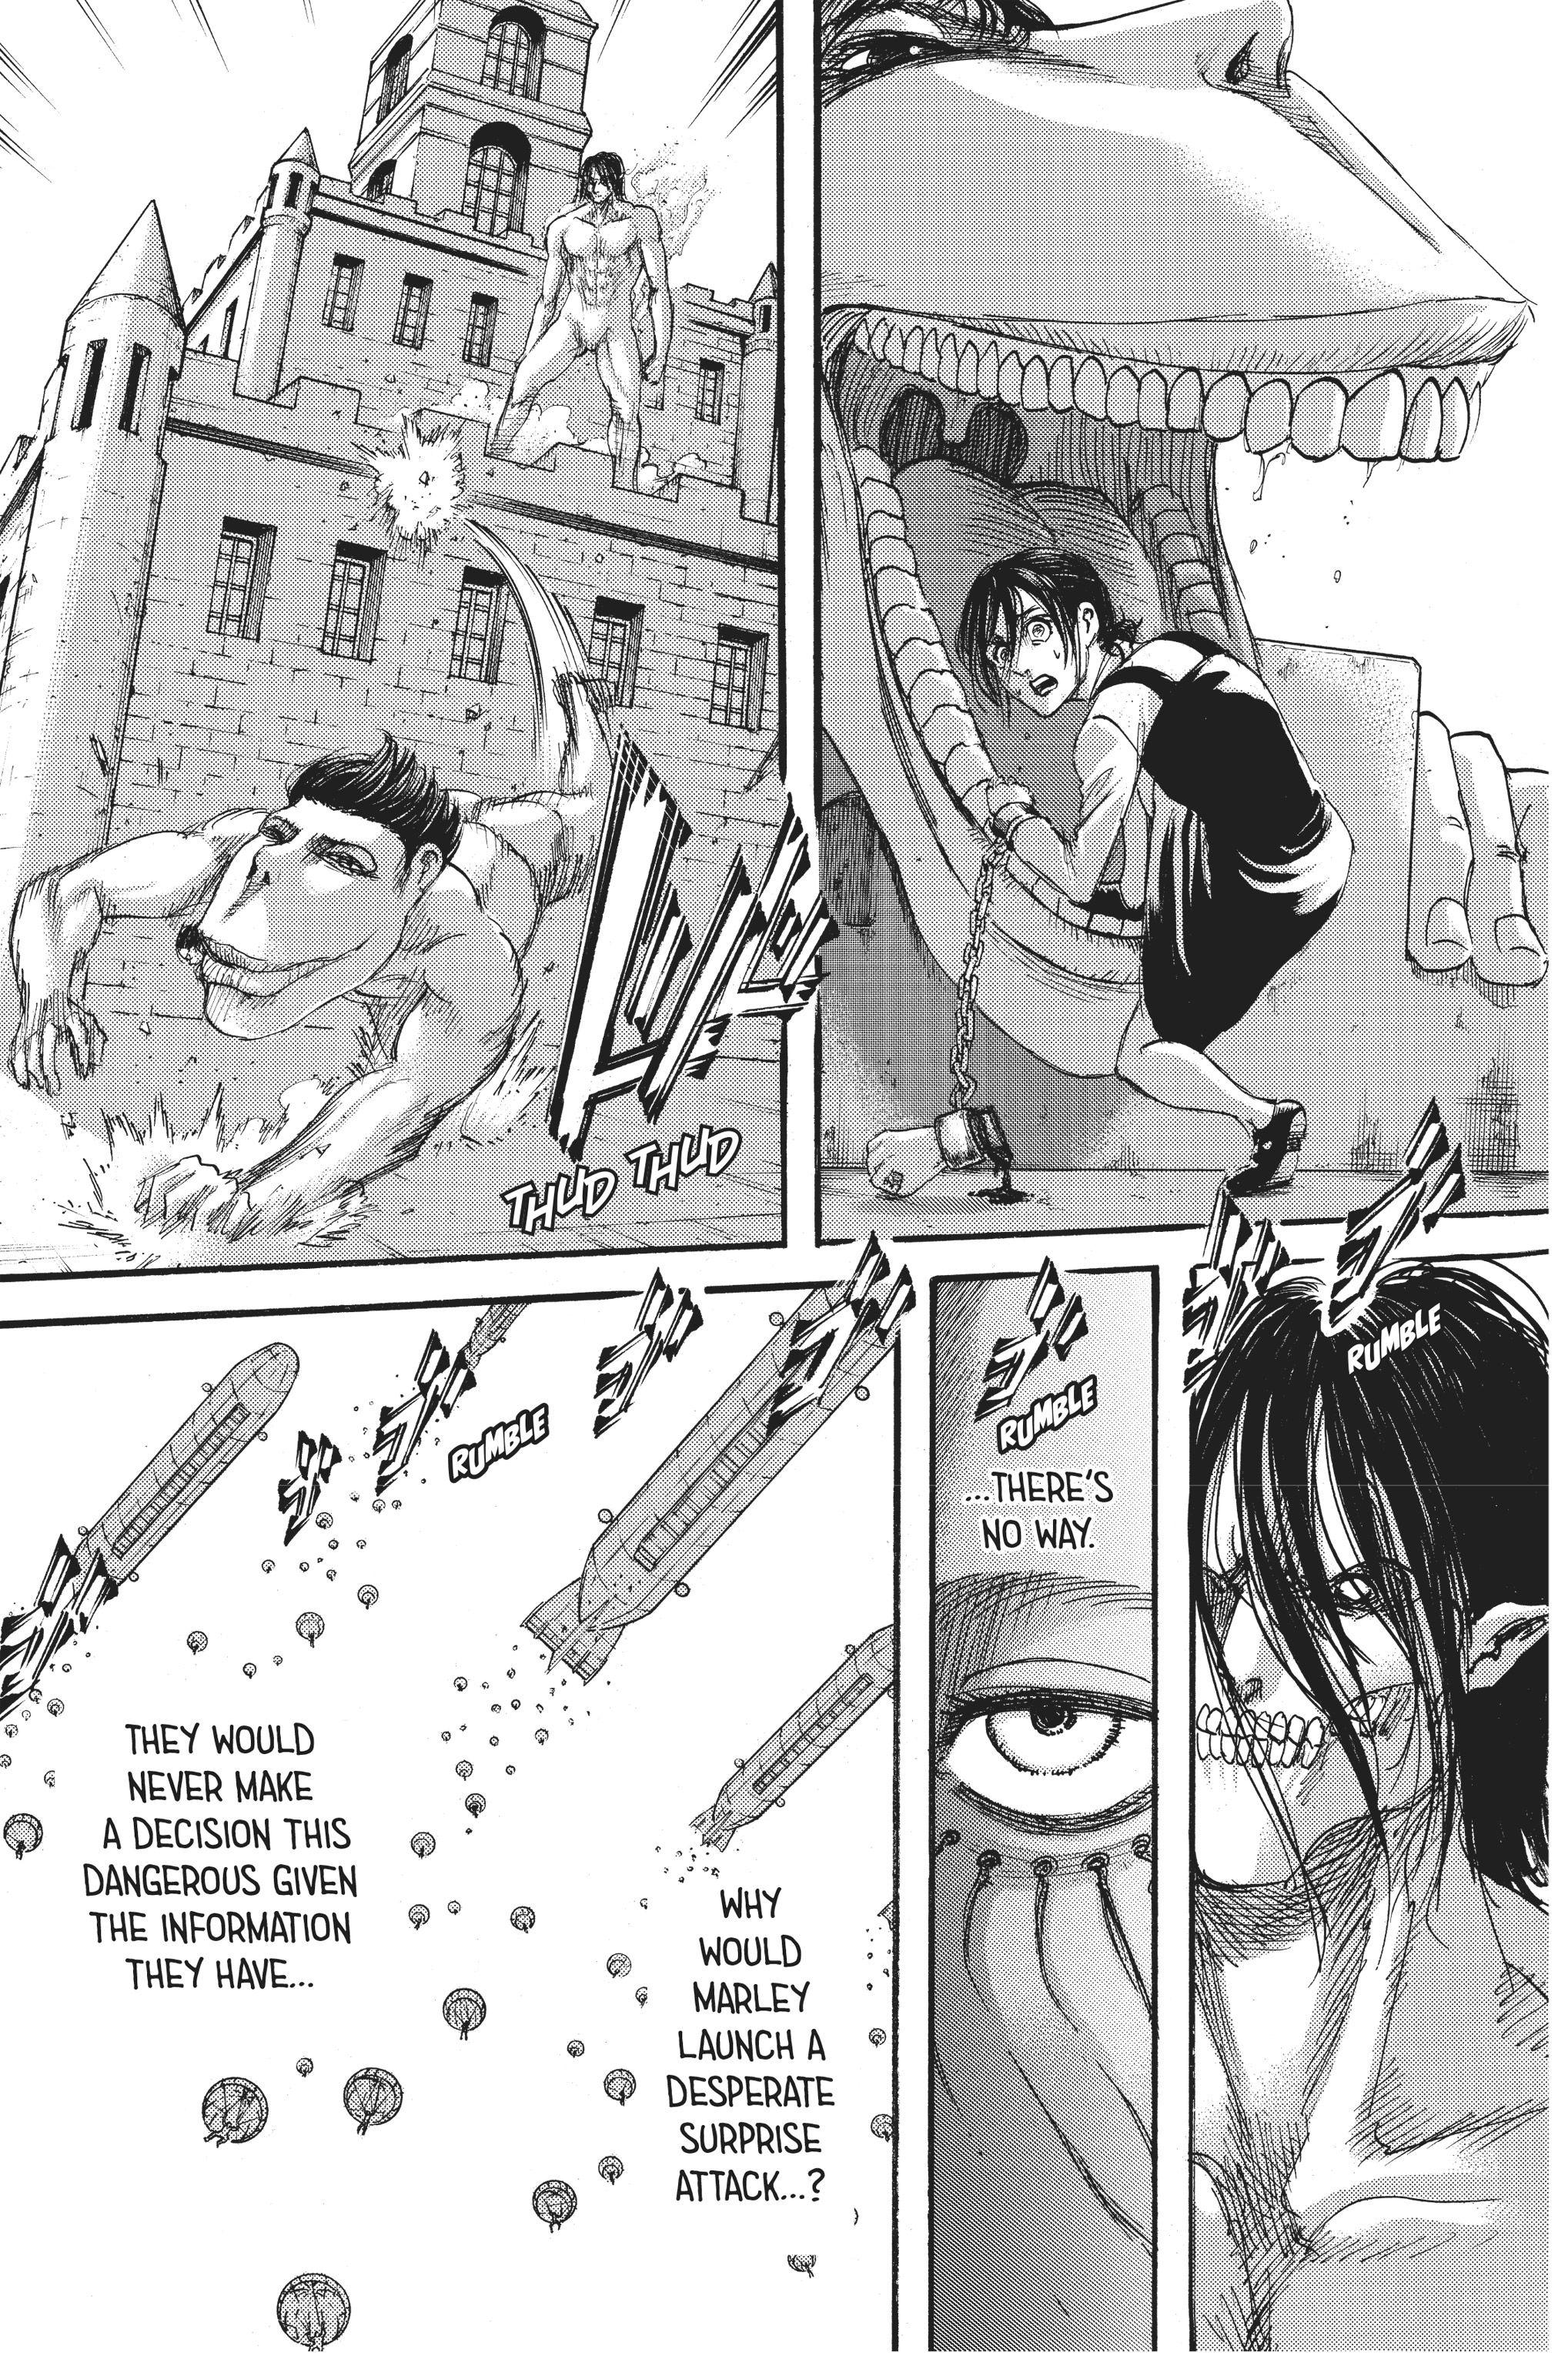 Shingeki No Kyojin Chapter 117 in 2020 Shingeki no